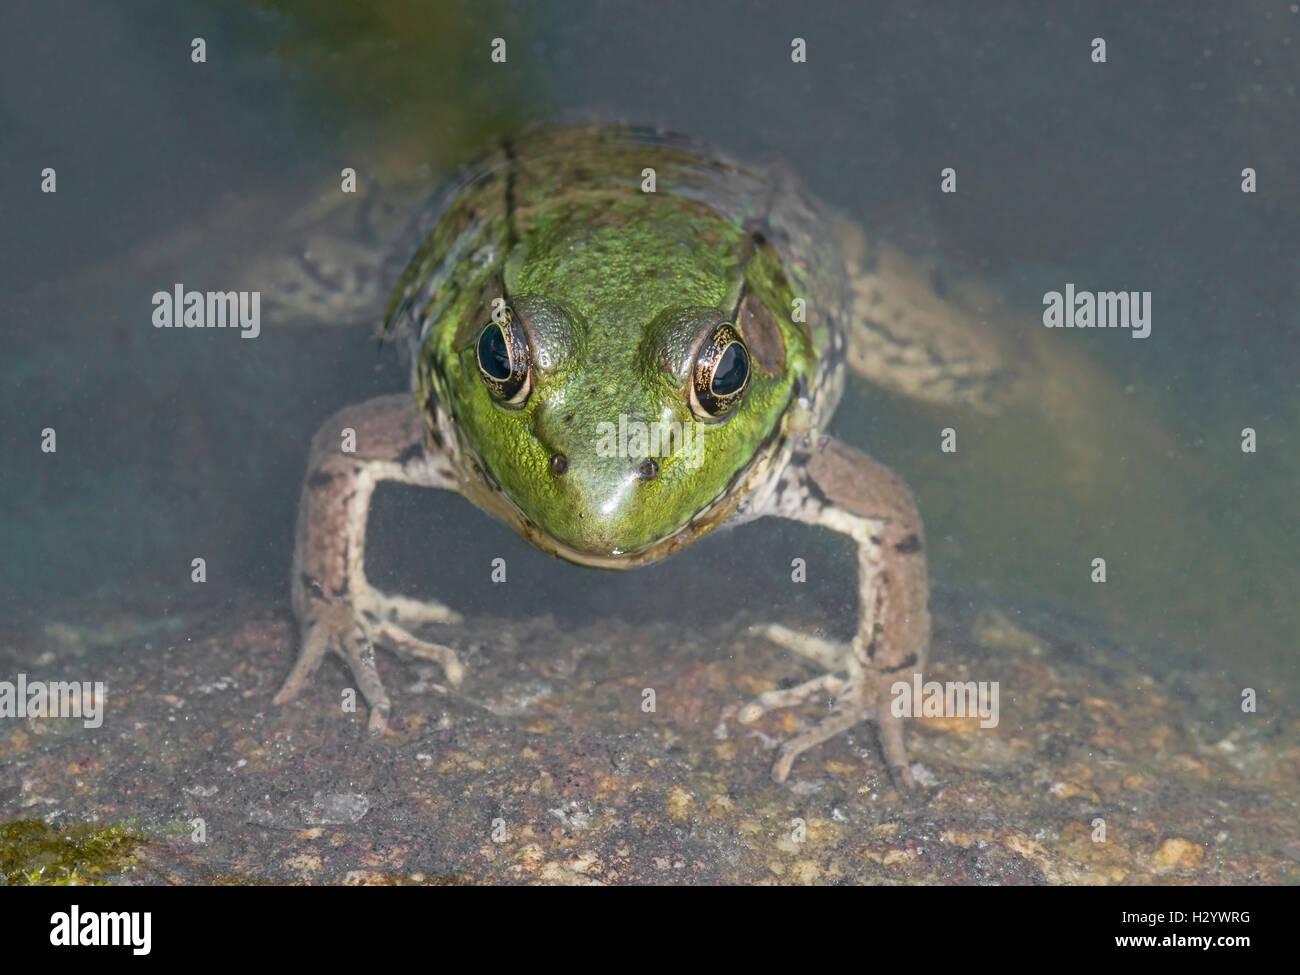 Grüner Frosch (Rana Clamitans), Teich, E USA von Skip Moody / Dembinsky Foto Associates Stockfoto